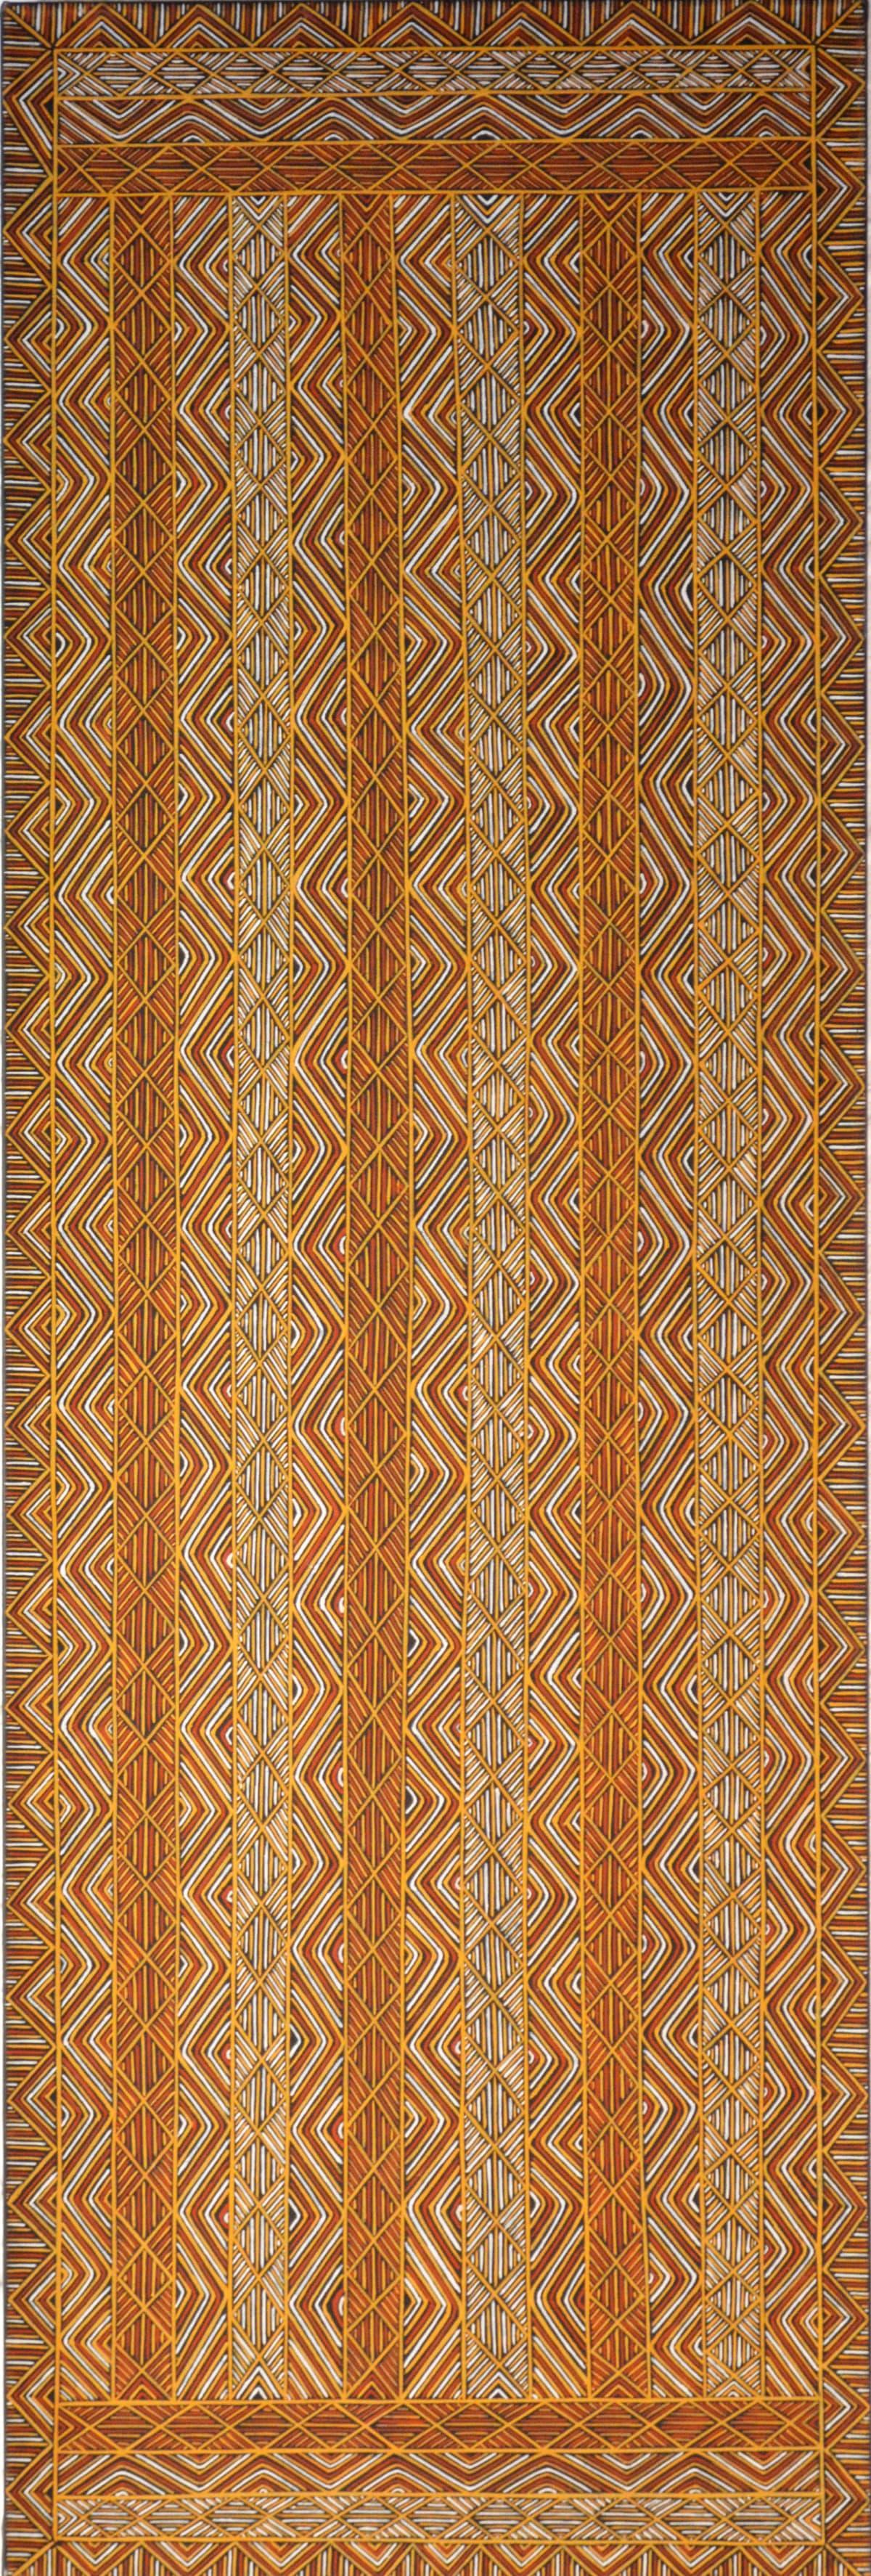 Nicholas Mario Jilamara natural ochres on linen 180 x 60 cm